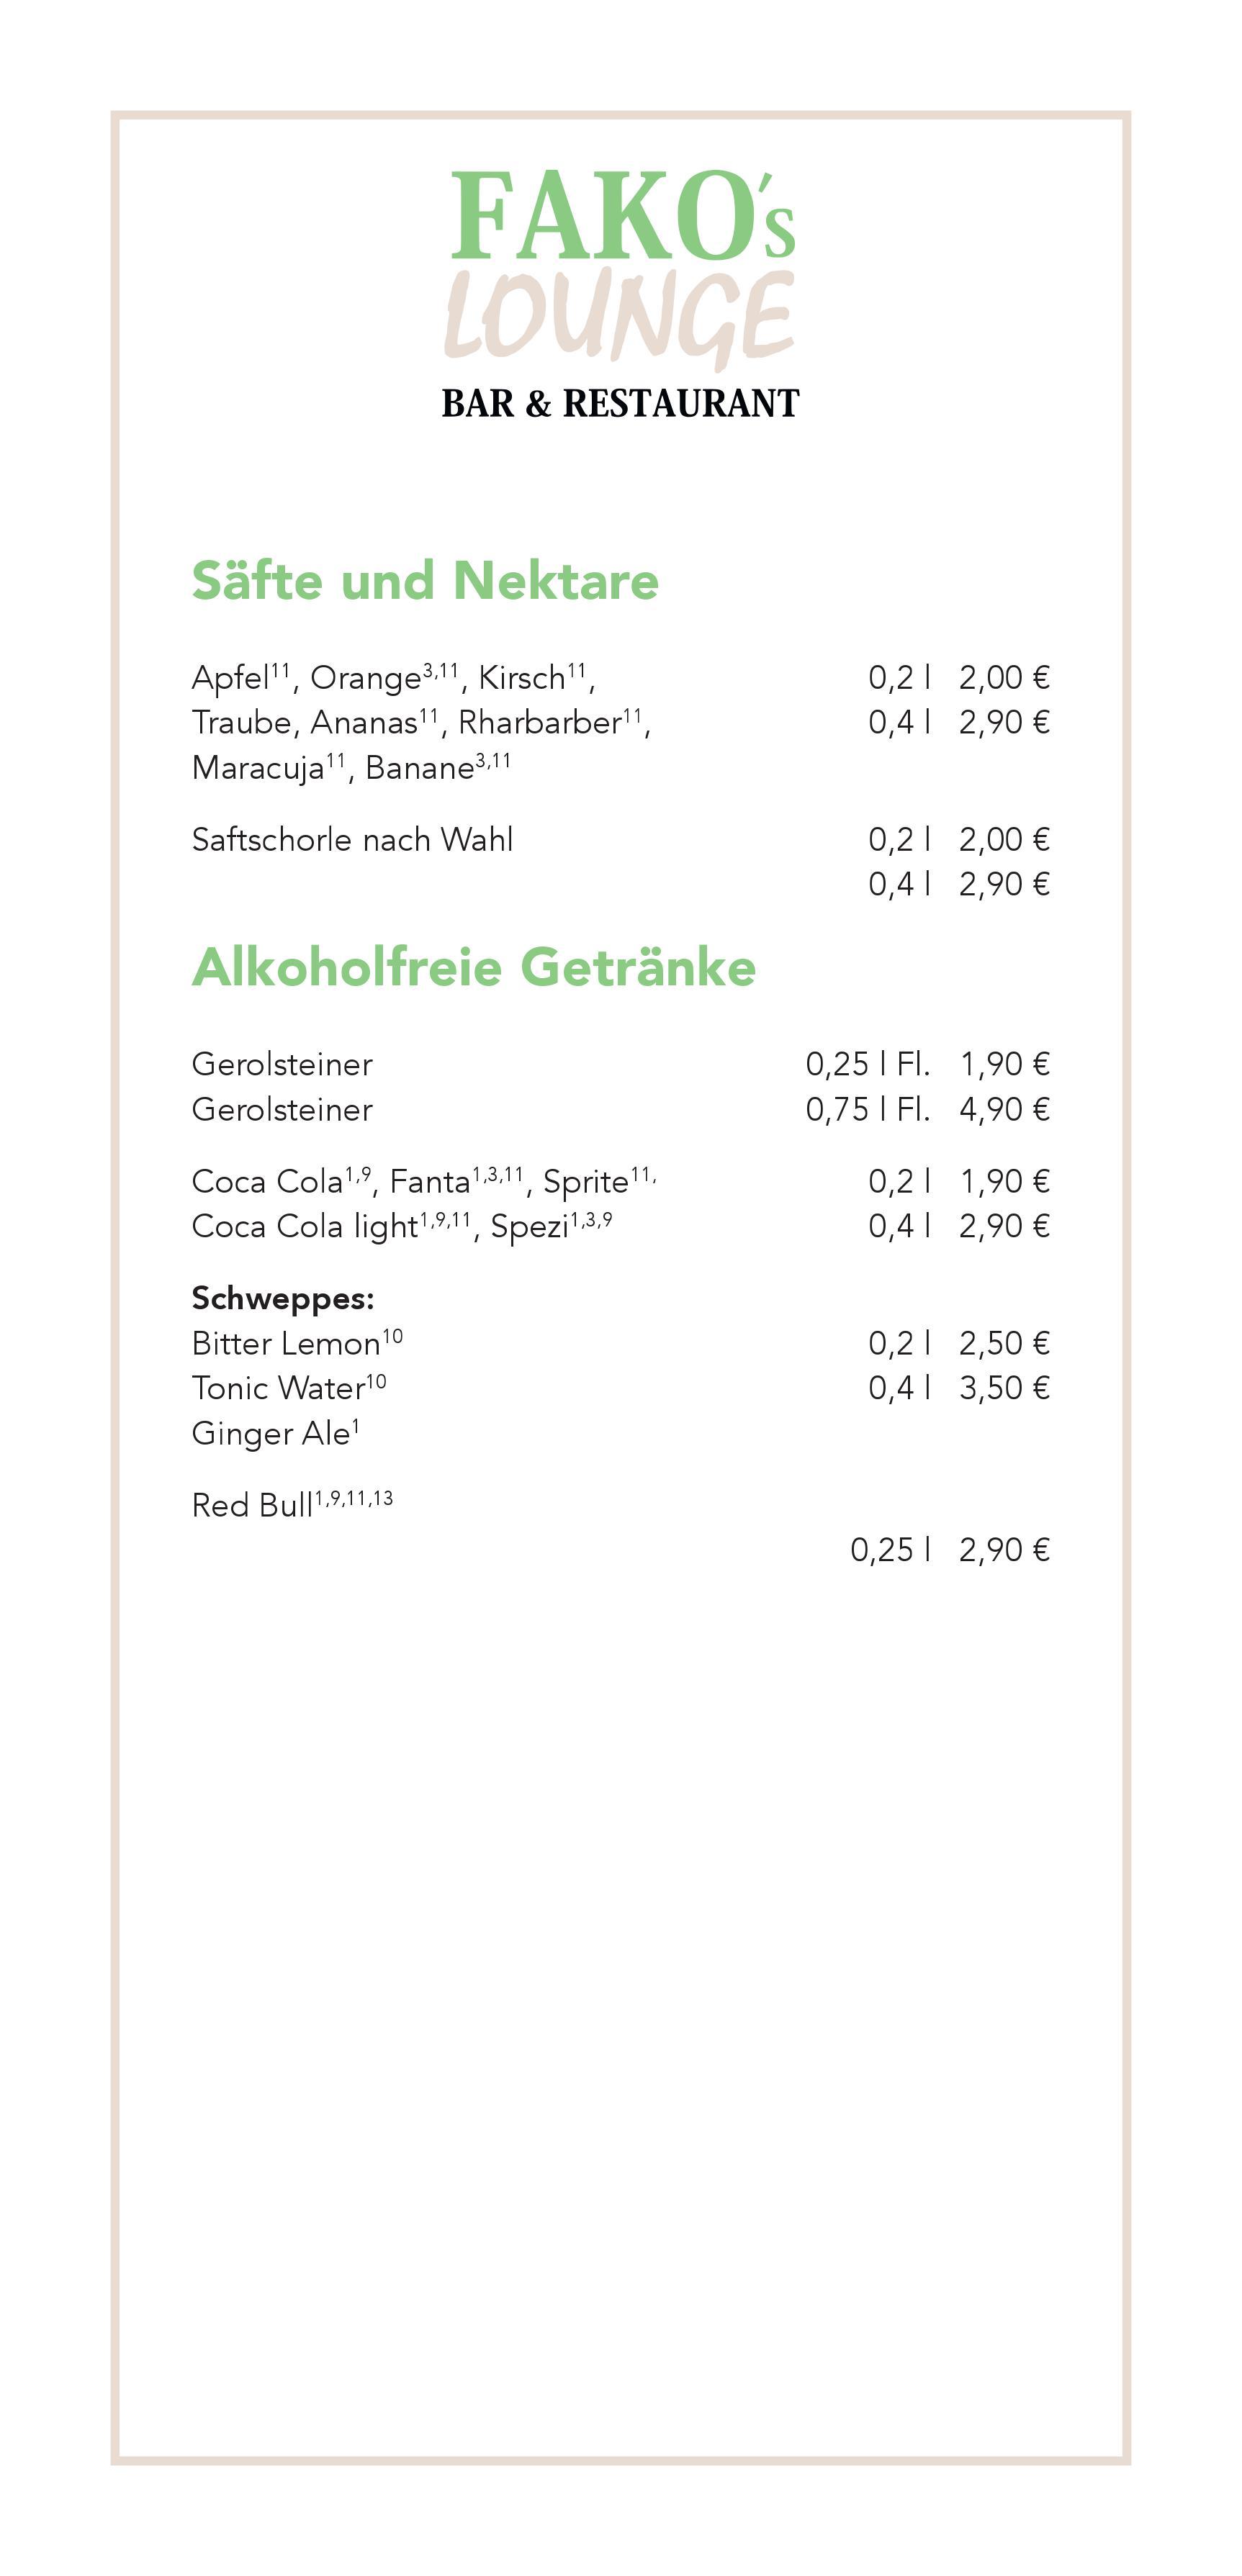 Alkoholfreie Getränke & Heiße Getränke | Fakos Lounge